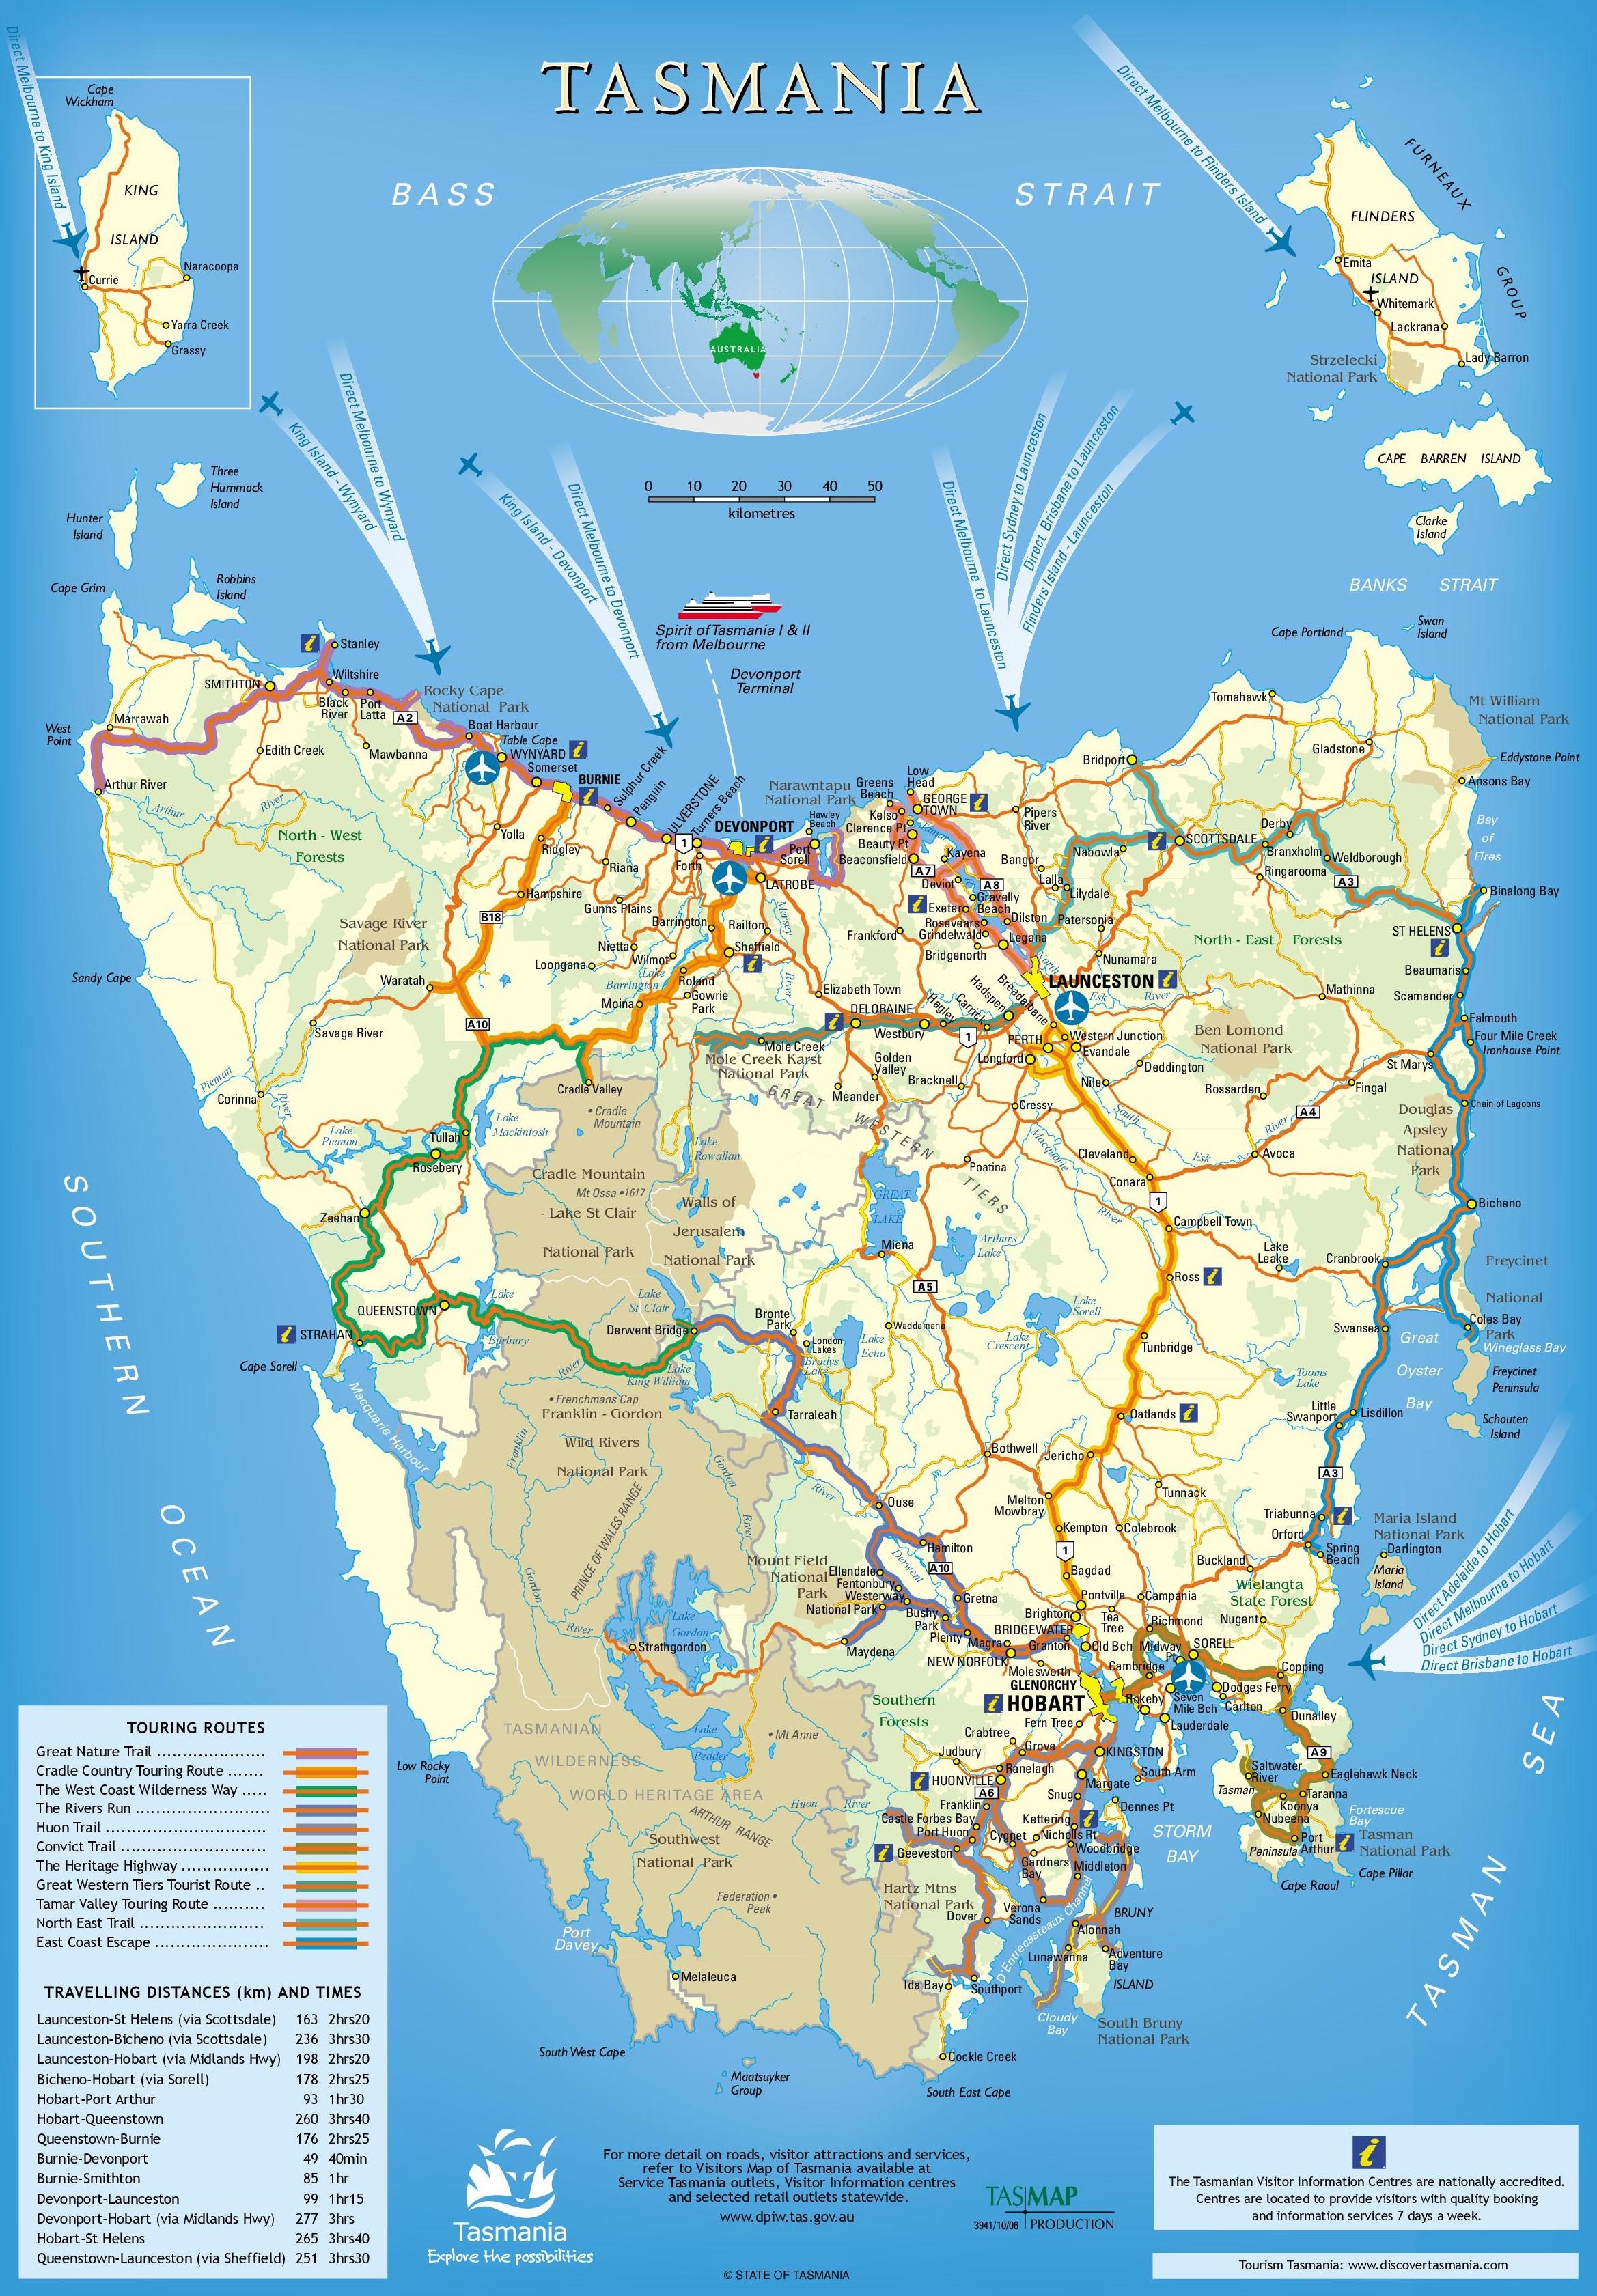 Detailed Map Of Tasmania Tasmania Maps | Australia | Maps of Tasmania (TAS) Detailed Map Of Tasmania